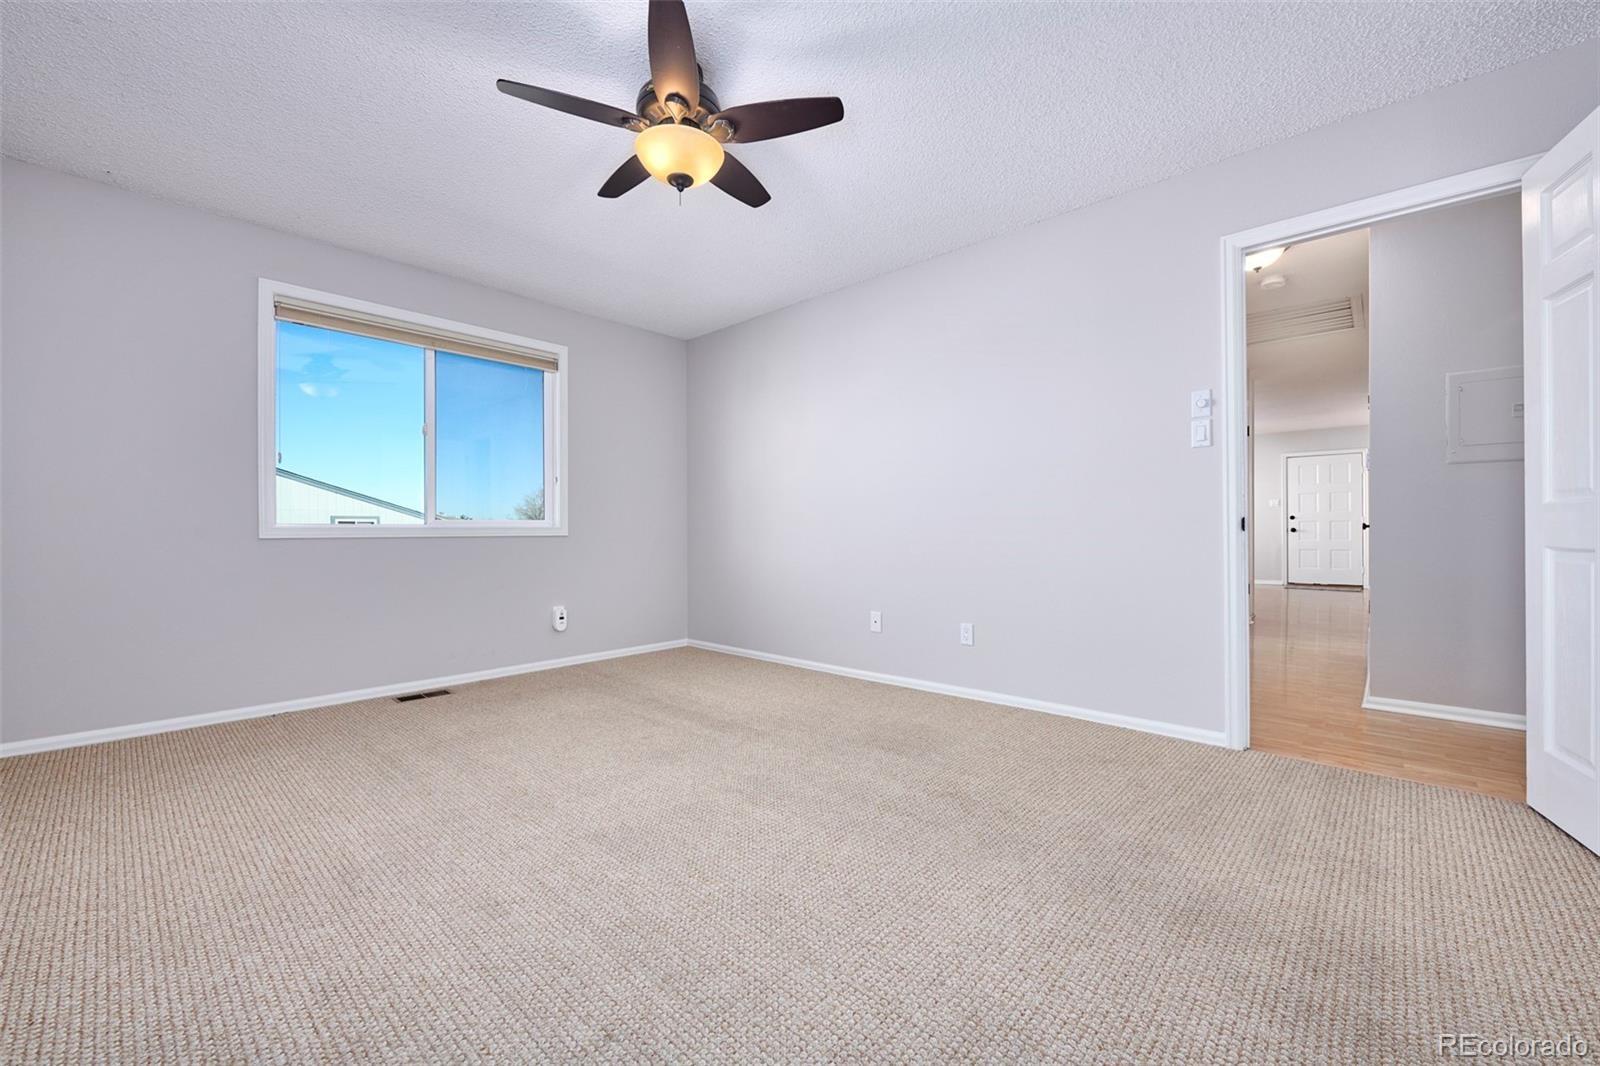 MLS# 4164486 - 13 - 4207 Monroe Drive #D, Boulder, CO 80303